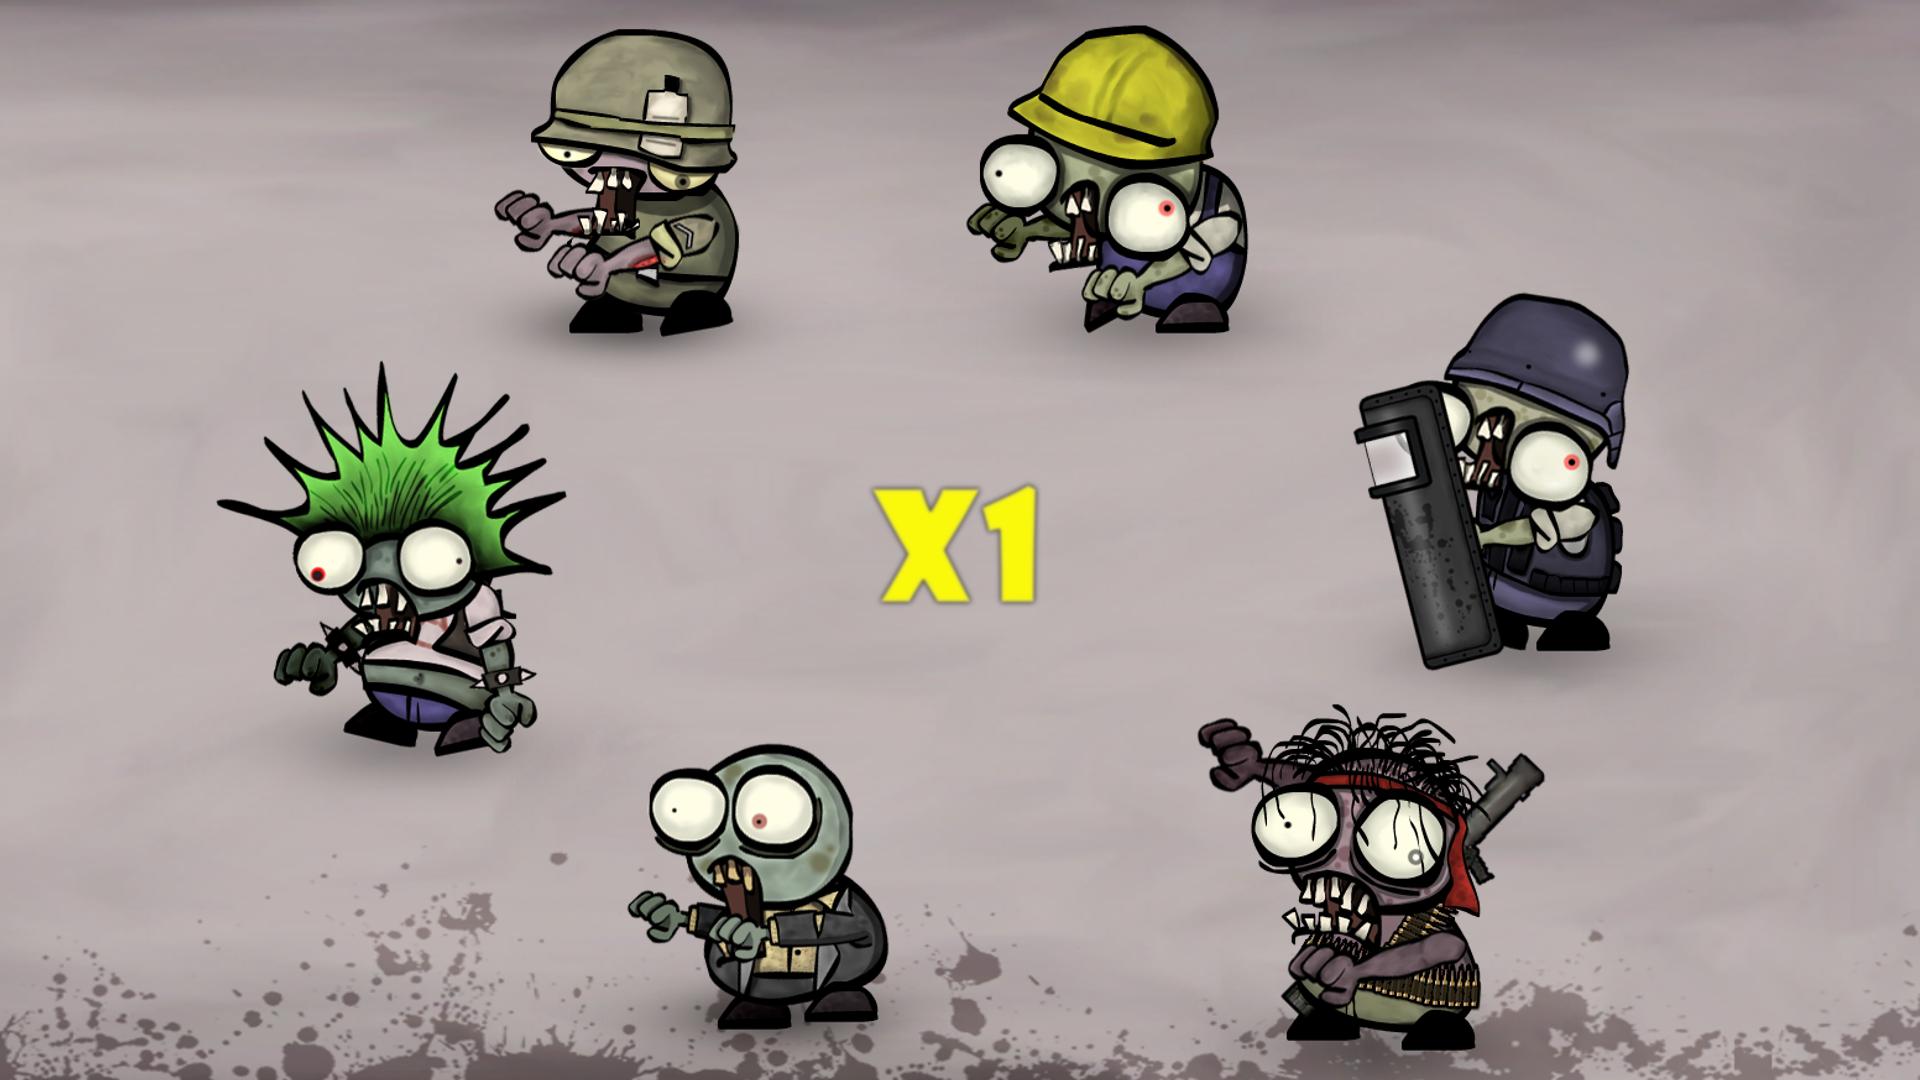 Icon for Zombie killer